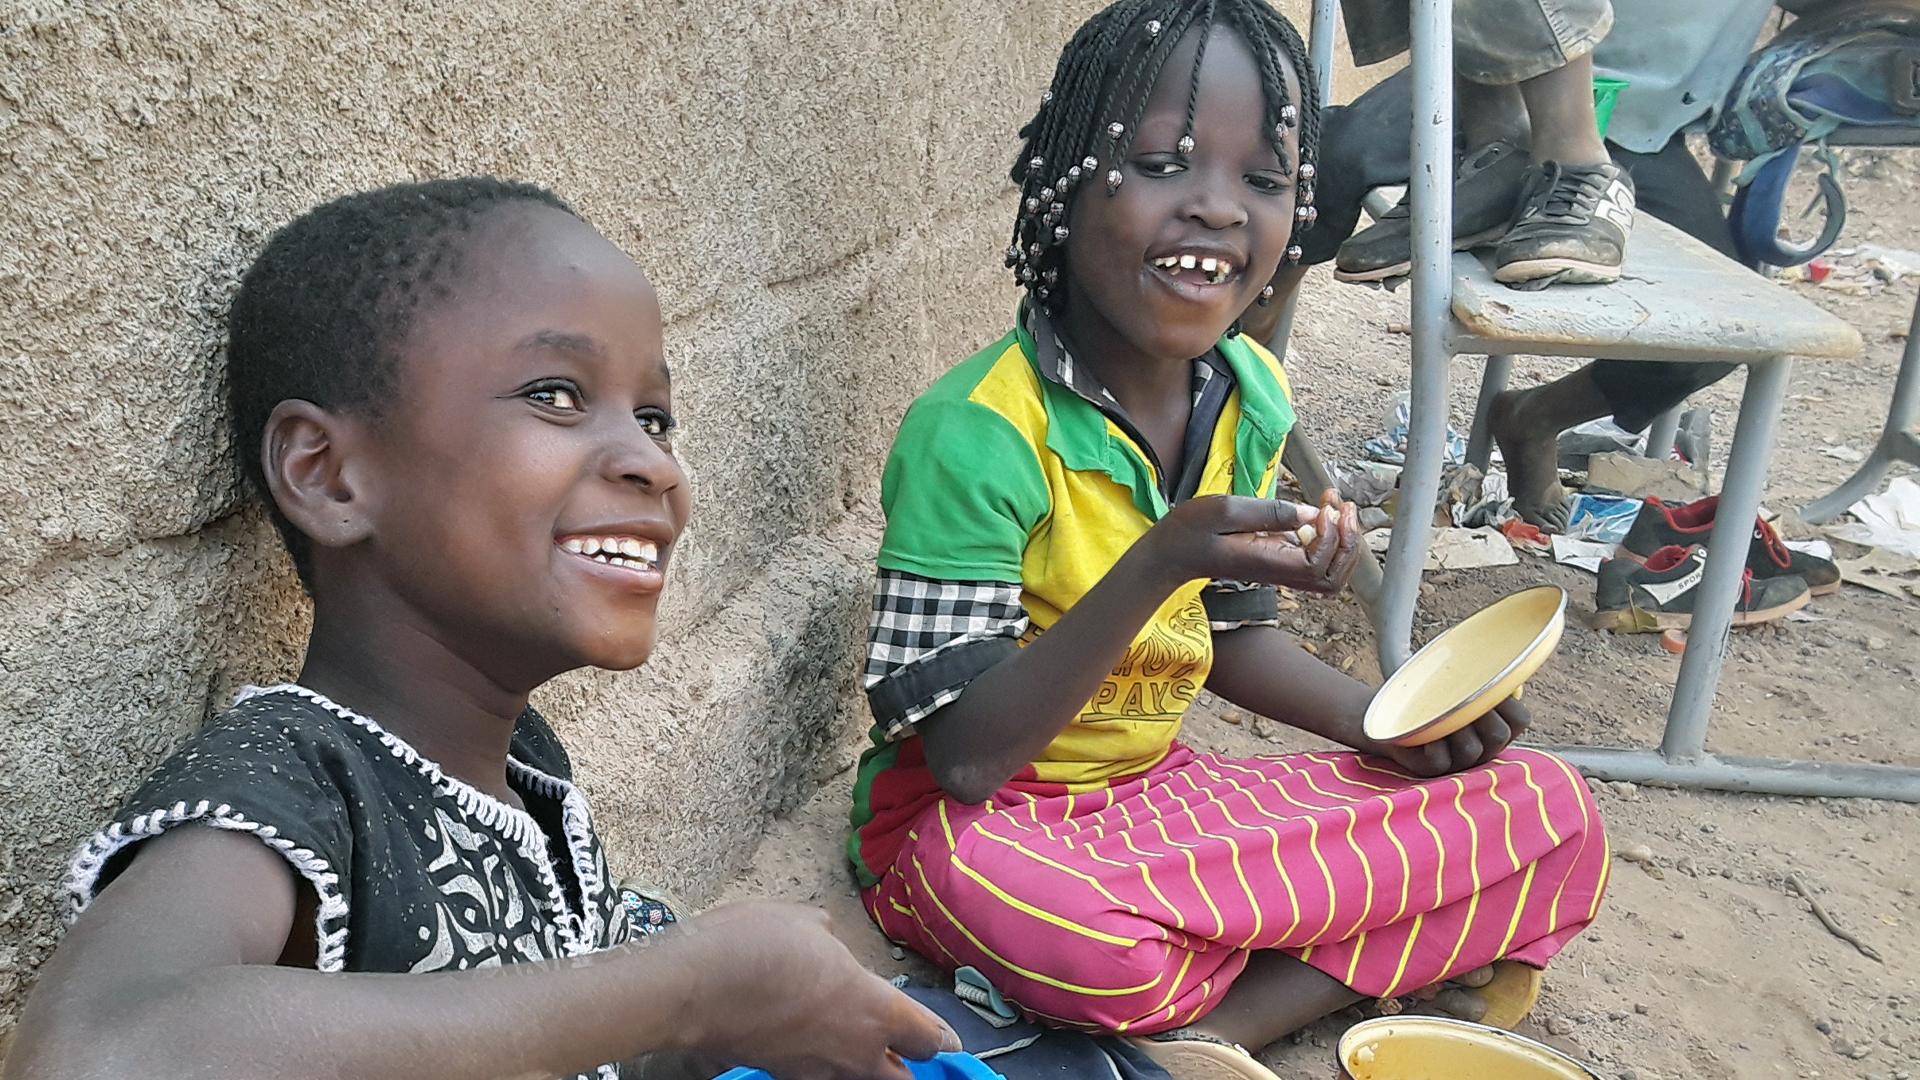 Primary-school students in Burkina Faso